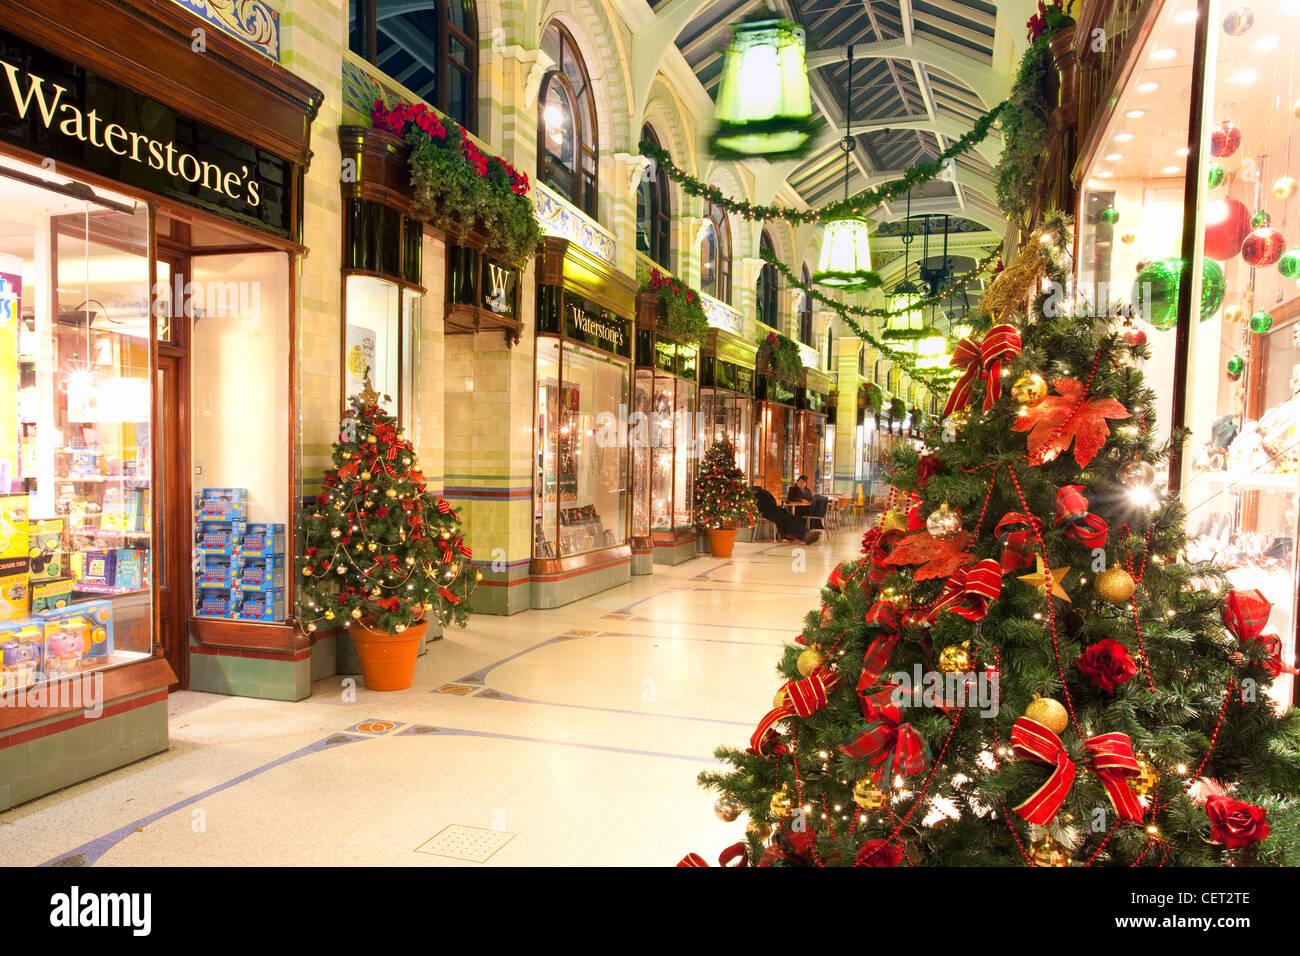 Images of kohls christmas kohls home decor for Home bargains xmas decorations